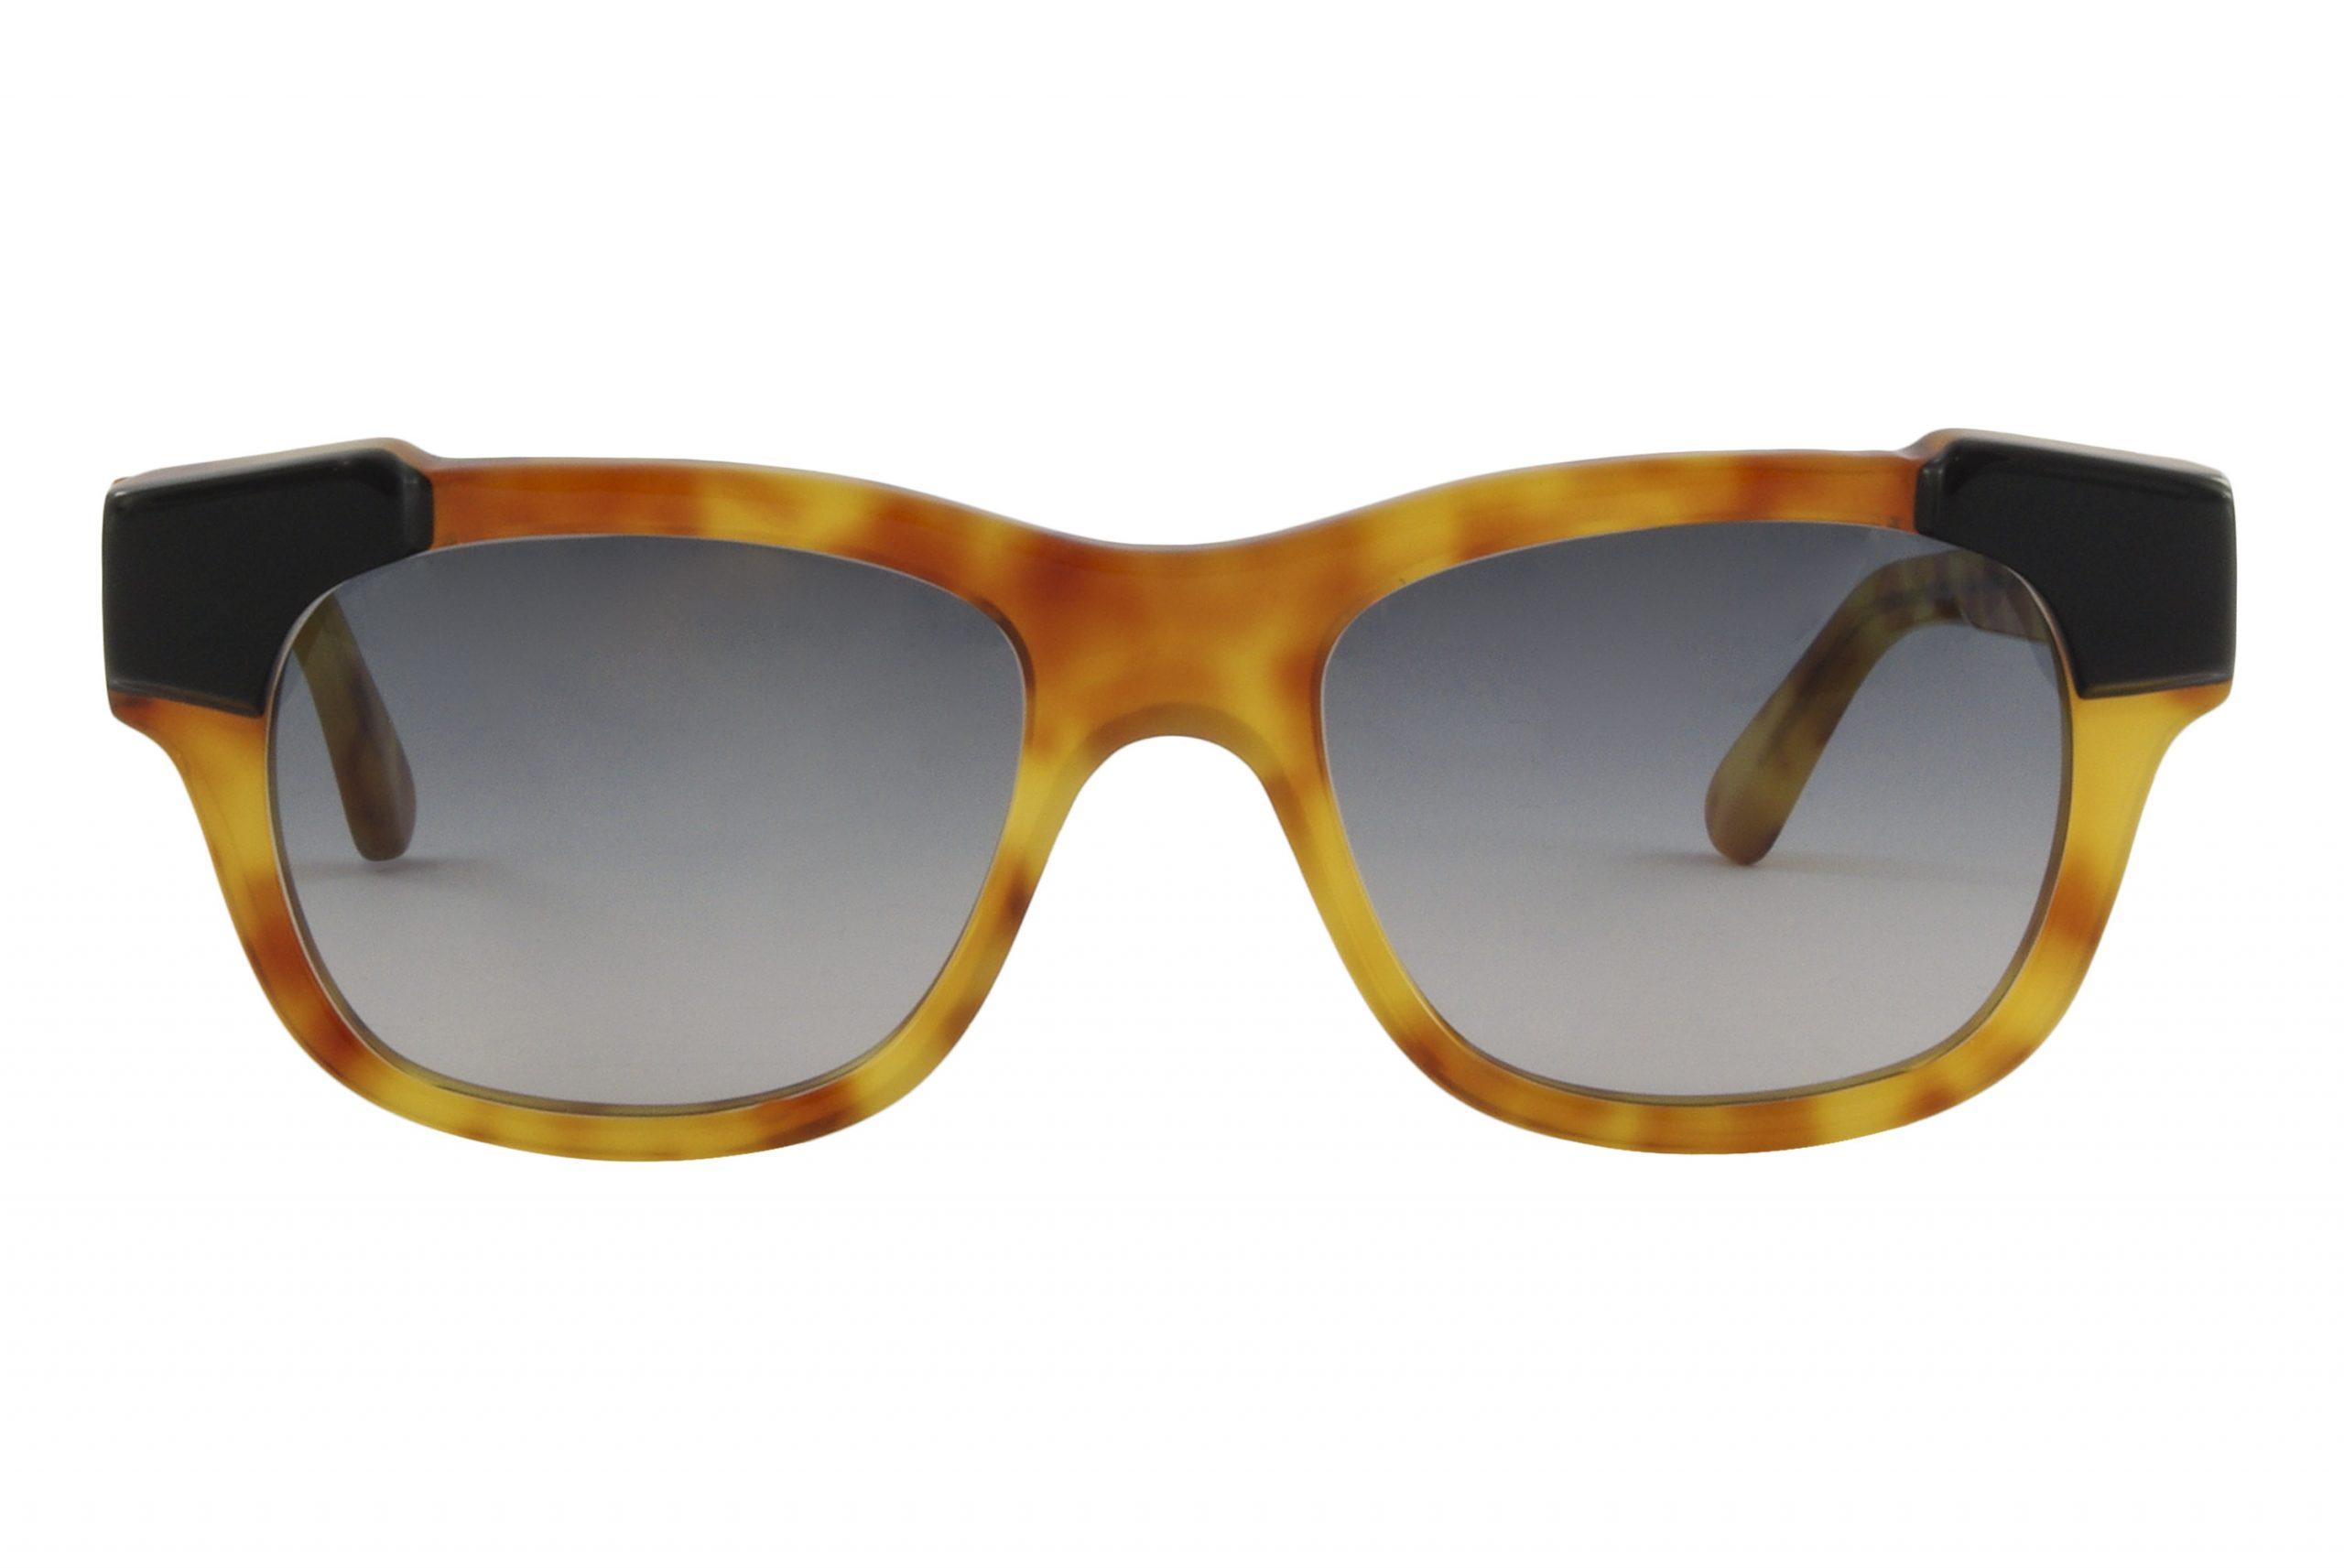 Occhiale Da Sole Jesmi Colore Tartaruga